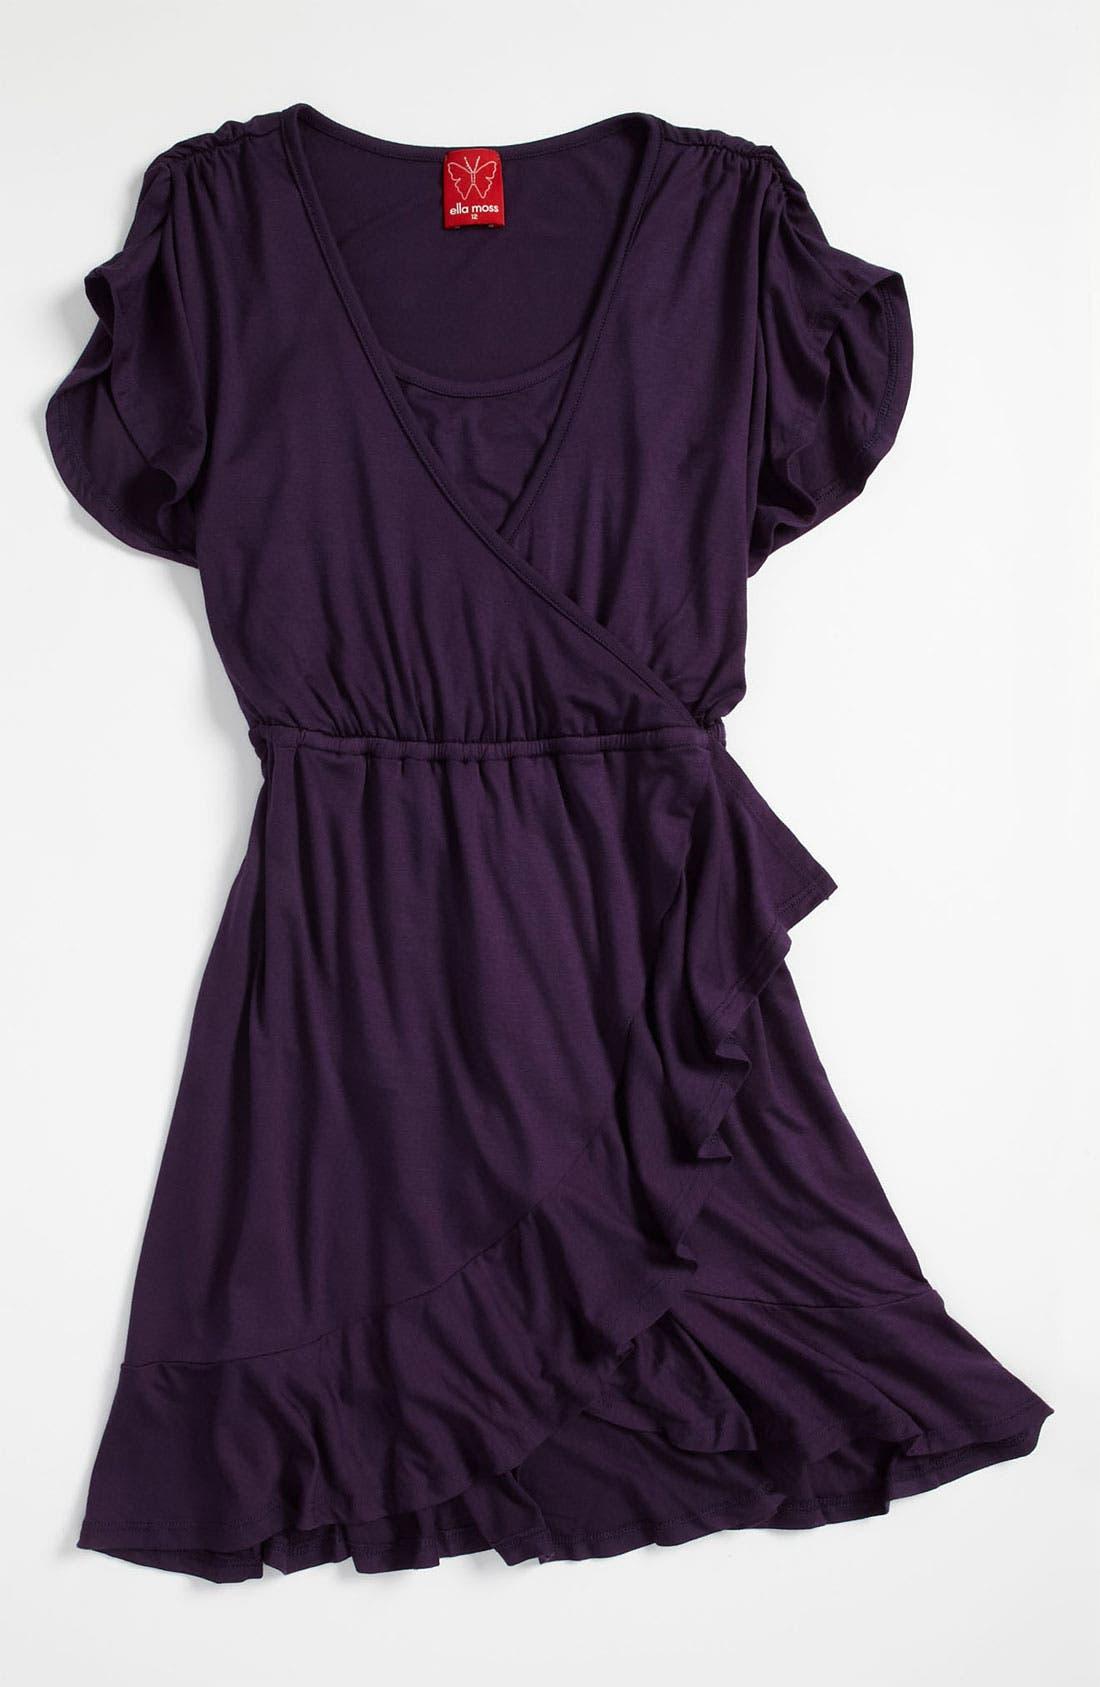 Main Image - Ella Moss 'Bella' Ruffle Dress (Big Girls)